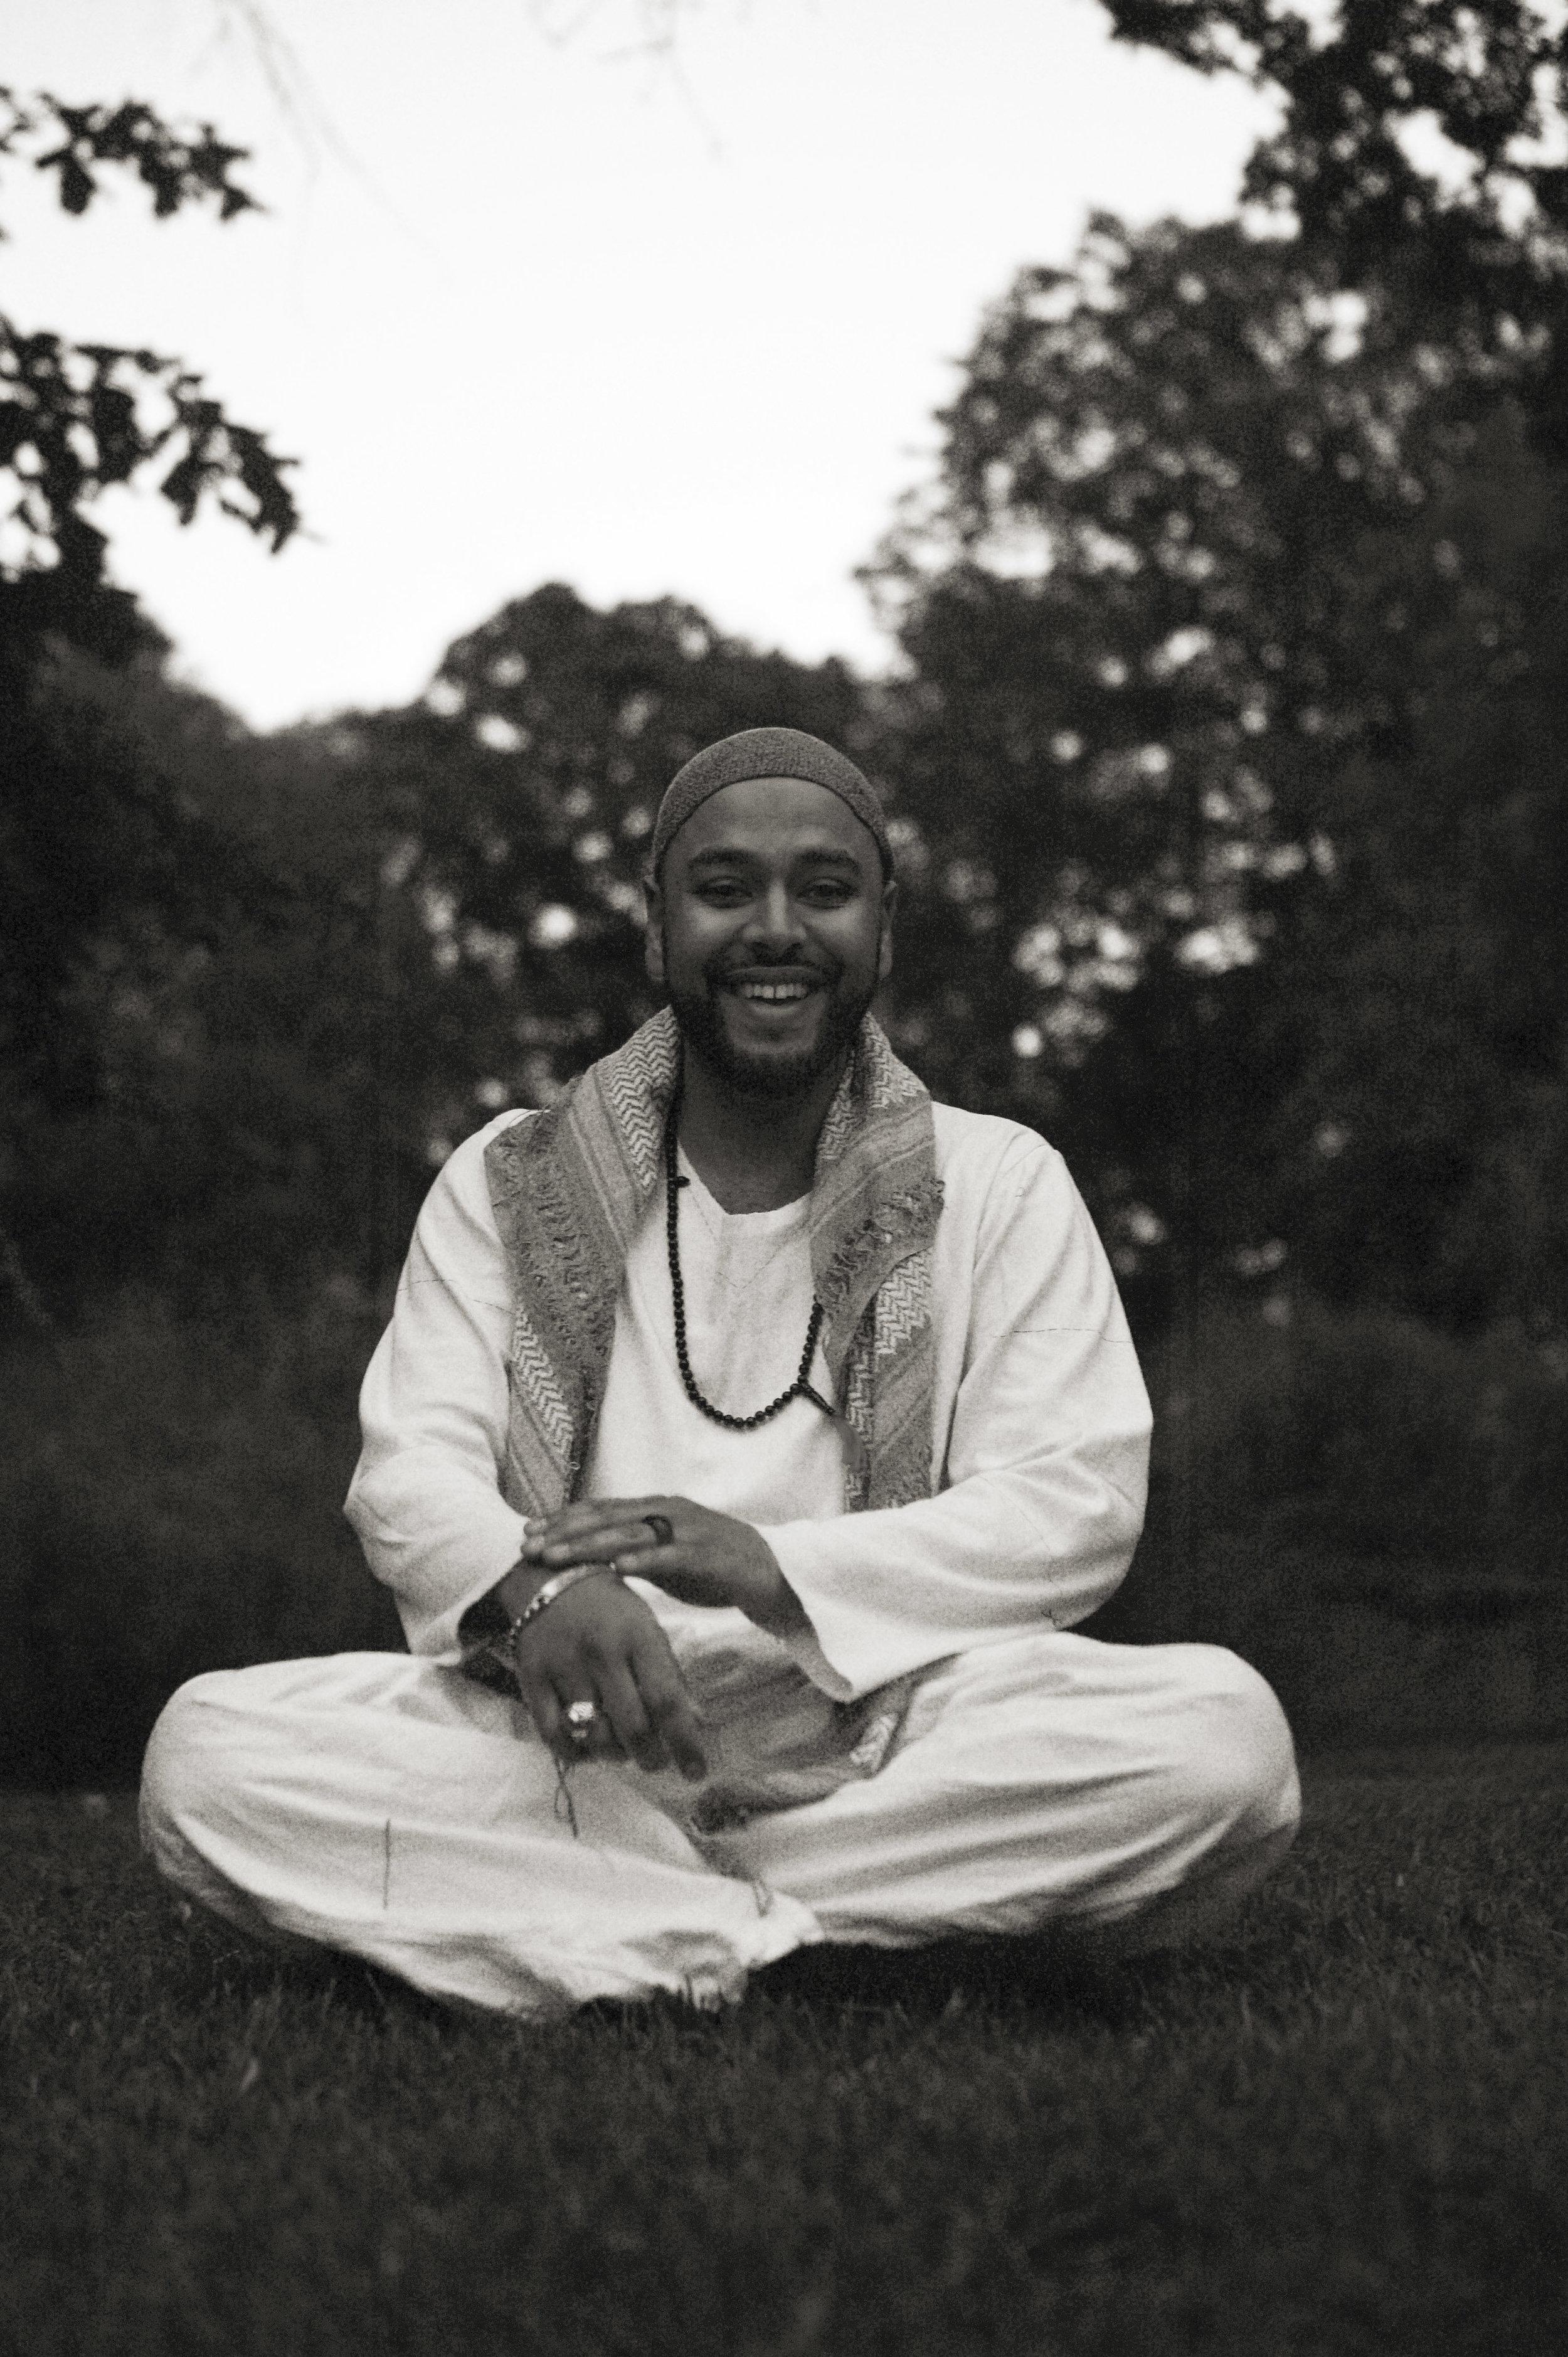 Ashar Khan - Amerykhan